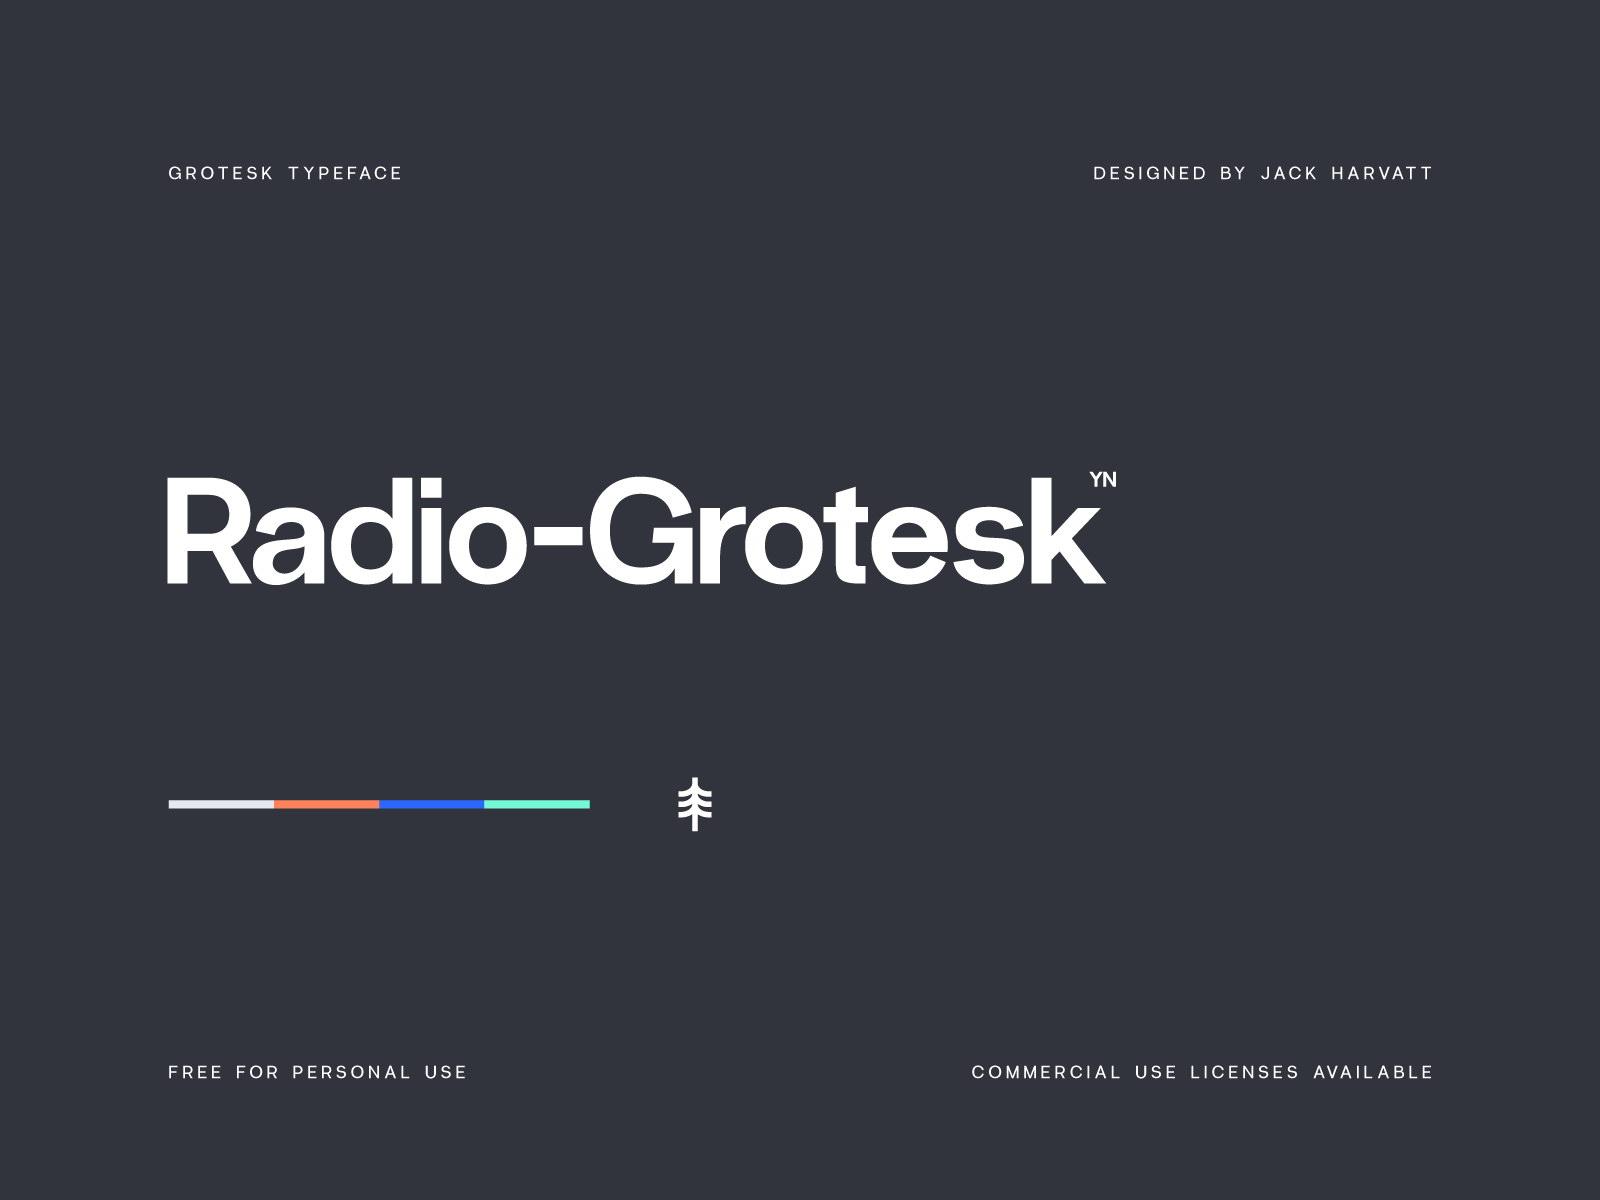 Radio-Grotesk Free Font